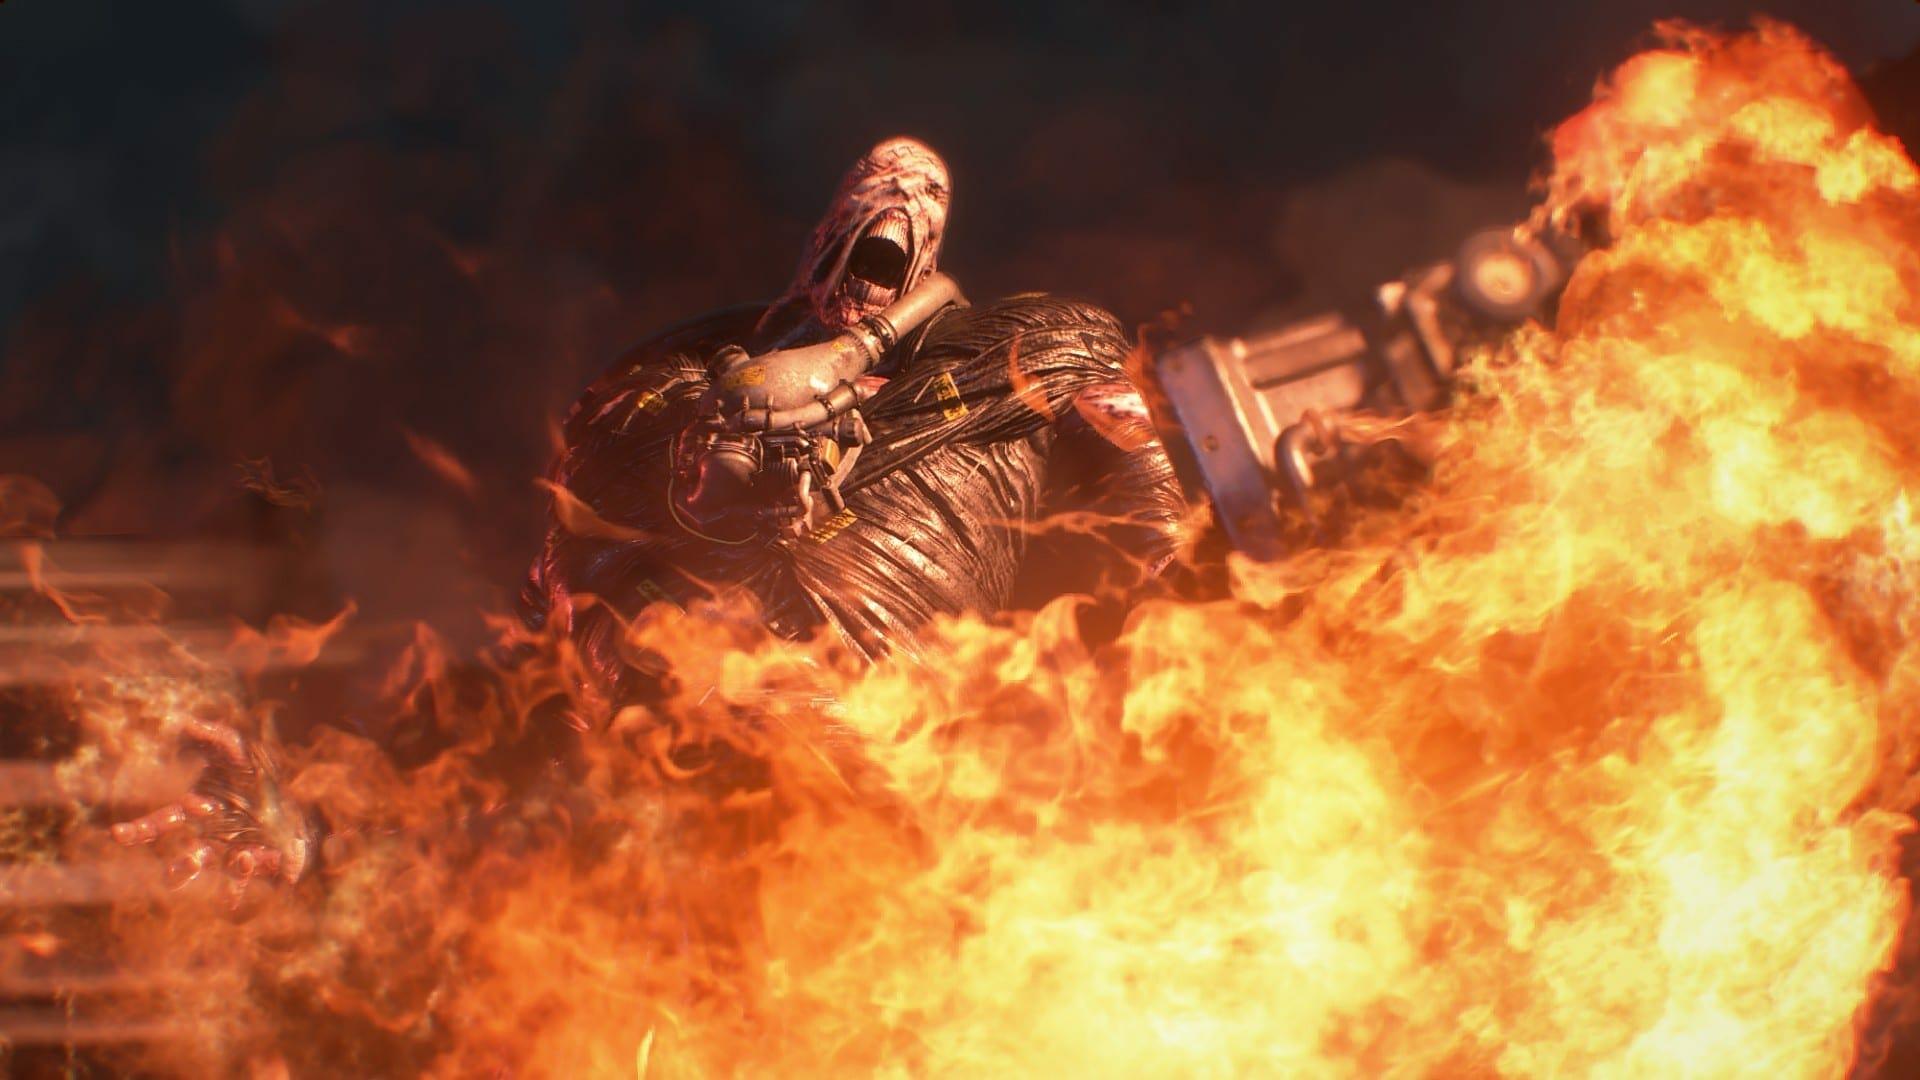 Screnshot 7 - Resident Evil 3 Remake: Release date, Pre-Order and Project Resistance Details Revealed